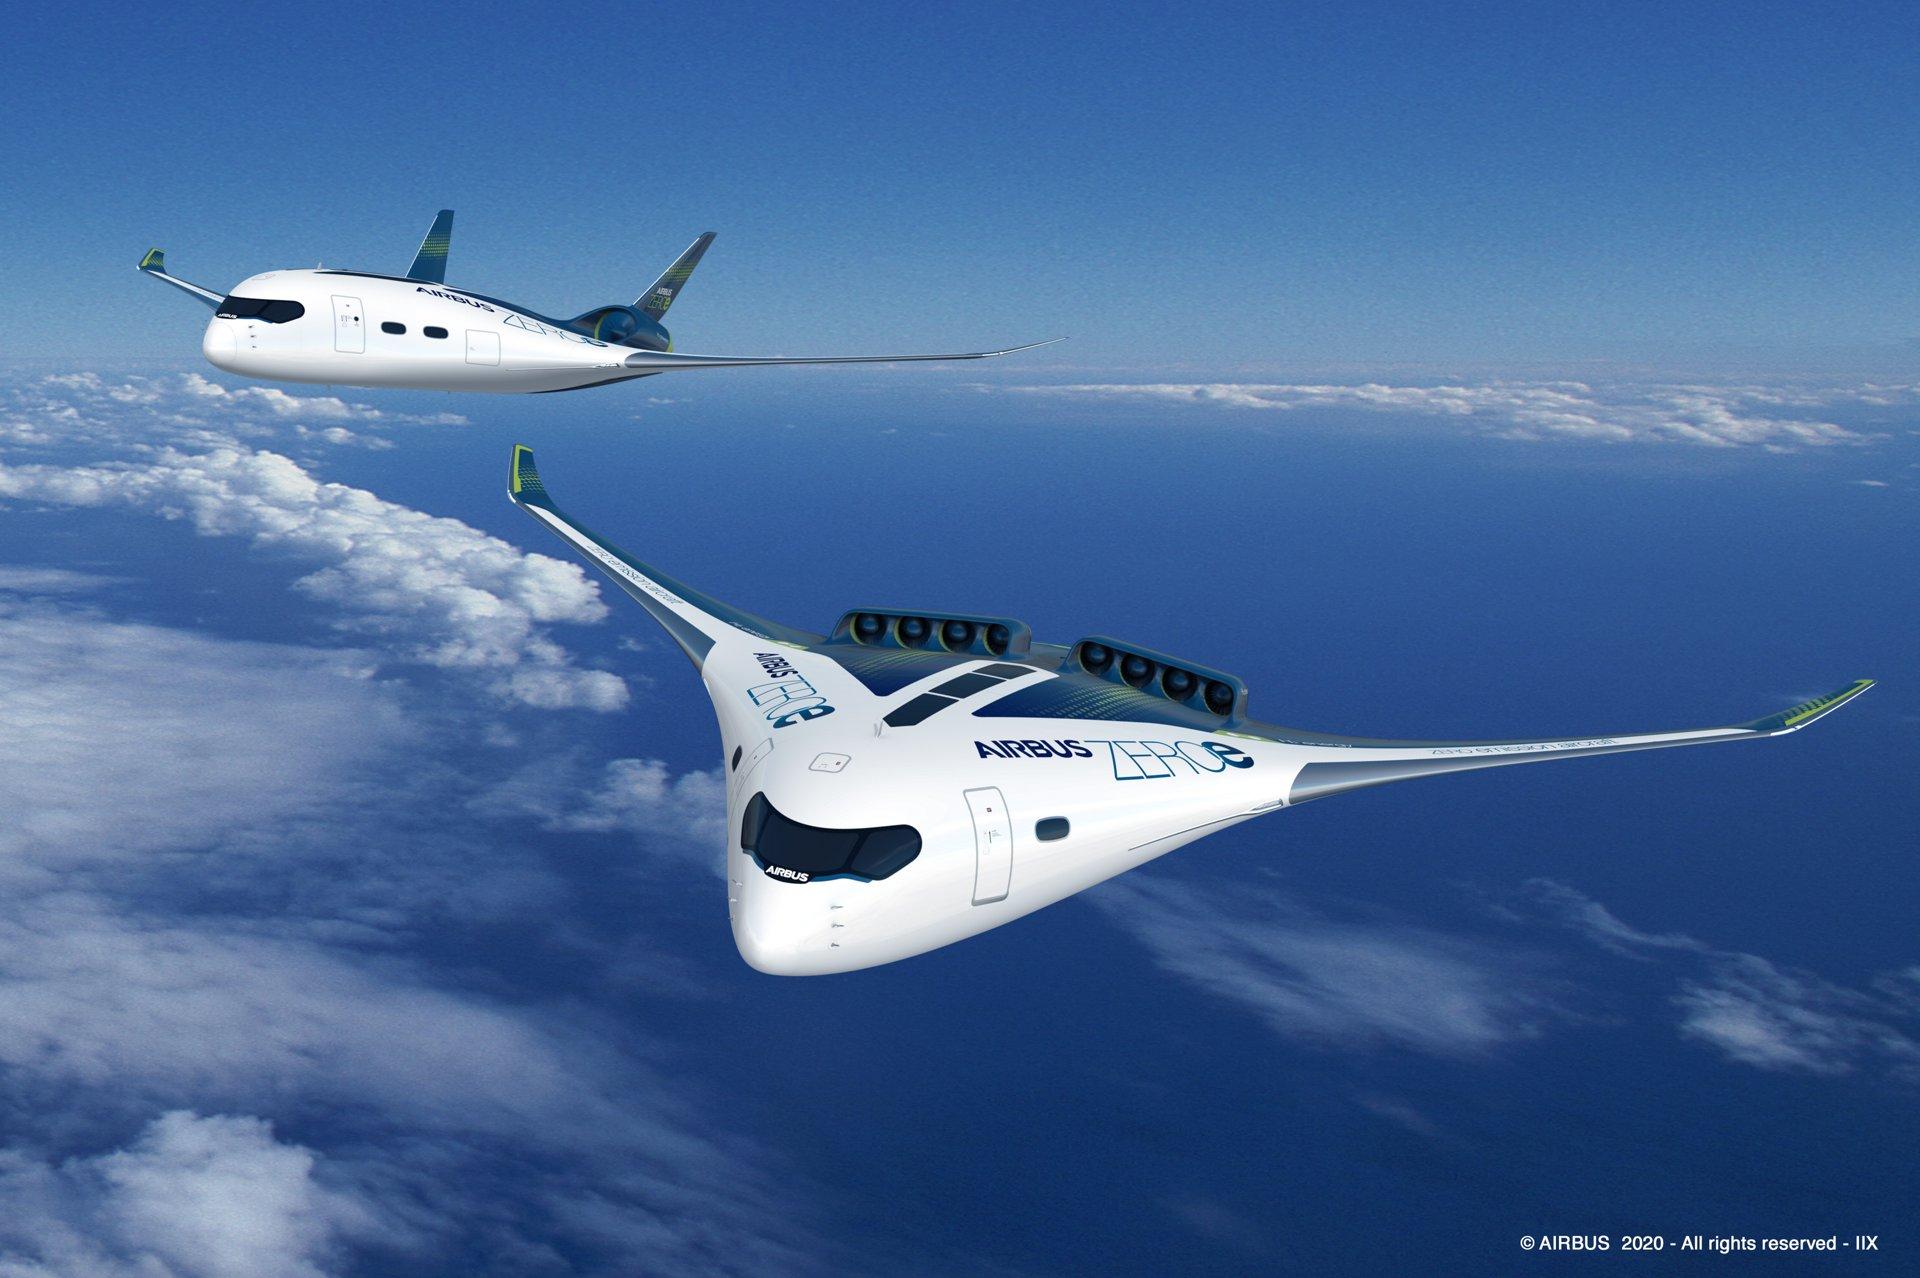 AirbusZeroE Blendedwing Conceptplanes B2